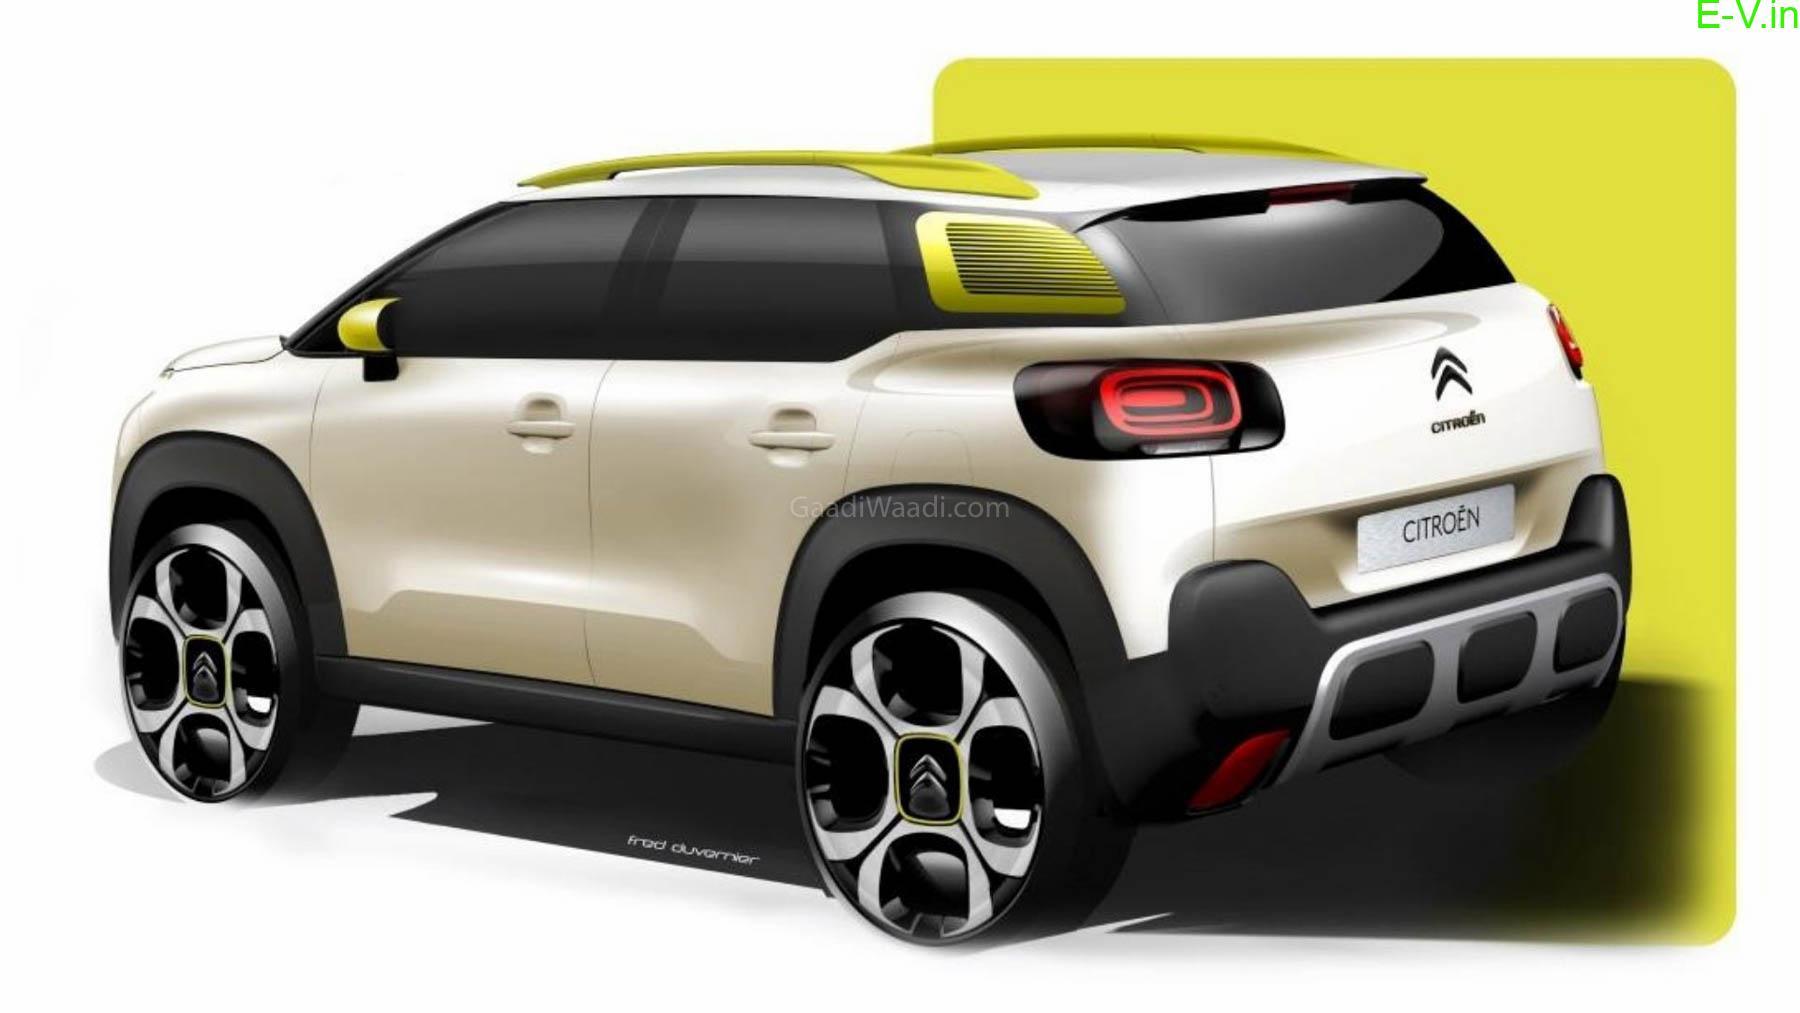 Upcoming electric car